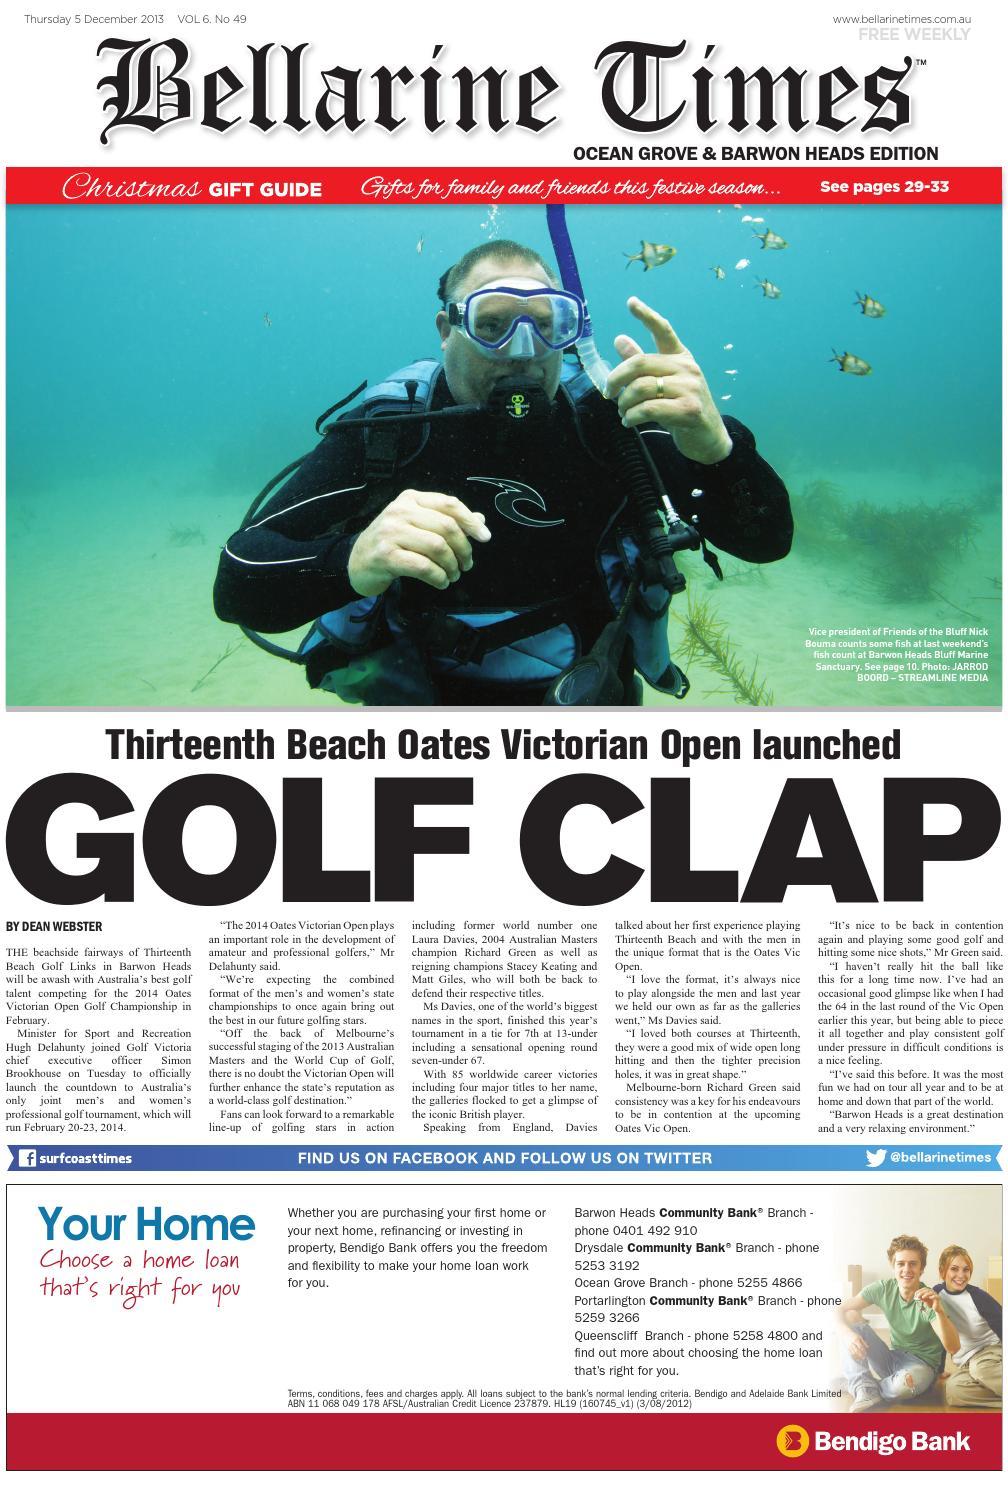 397a8ecd16ae Bellarine Times Ocean Grove: December 5, 2013 by Surf Coast News Australia  Pty Ltd - issuu